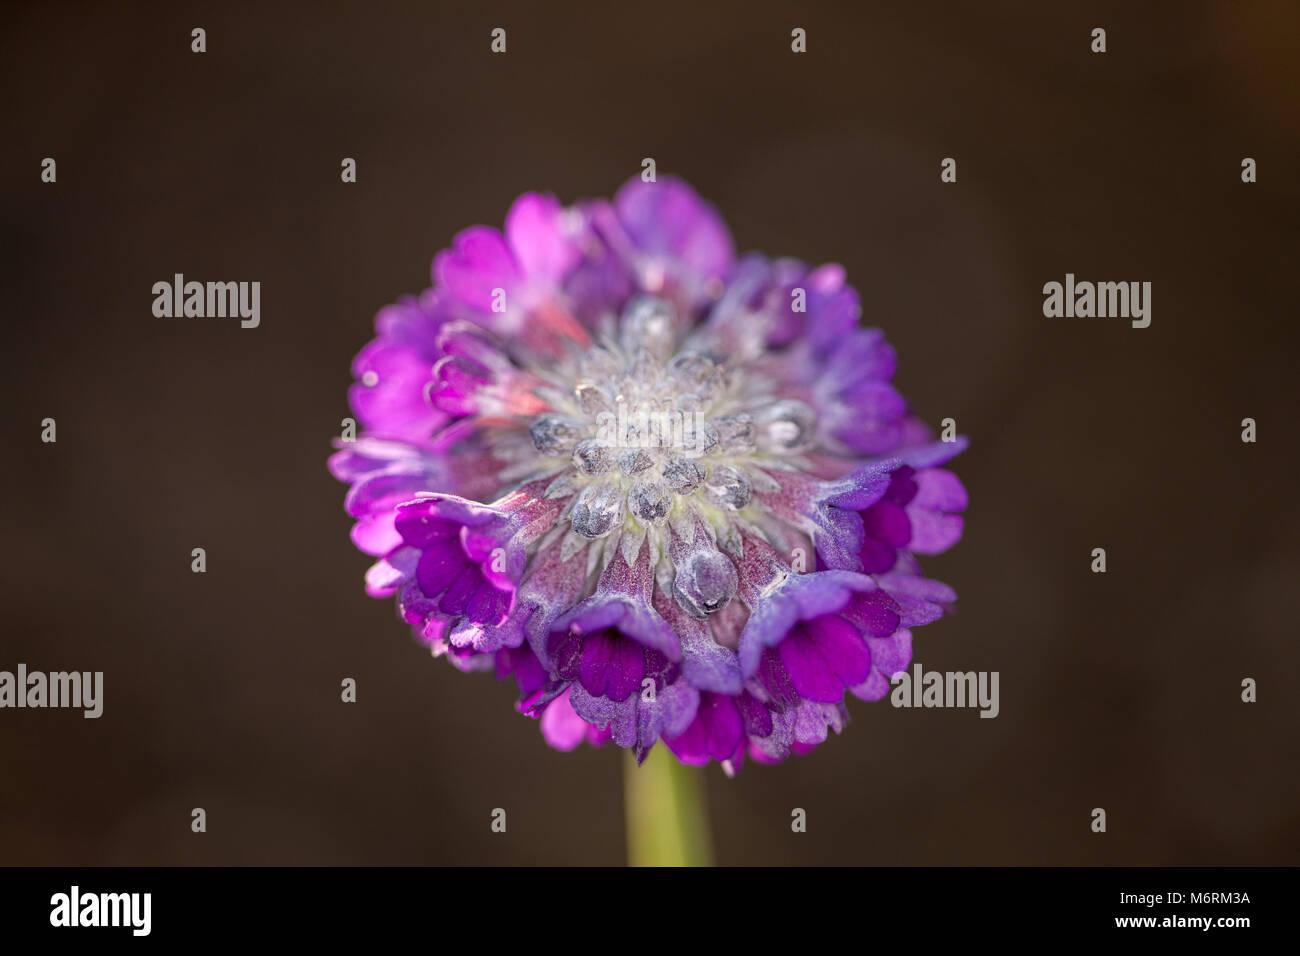 Round-headed Himalayan primrose, Tofsviva (Primula capitata) - Stock Image